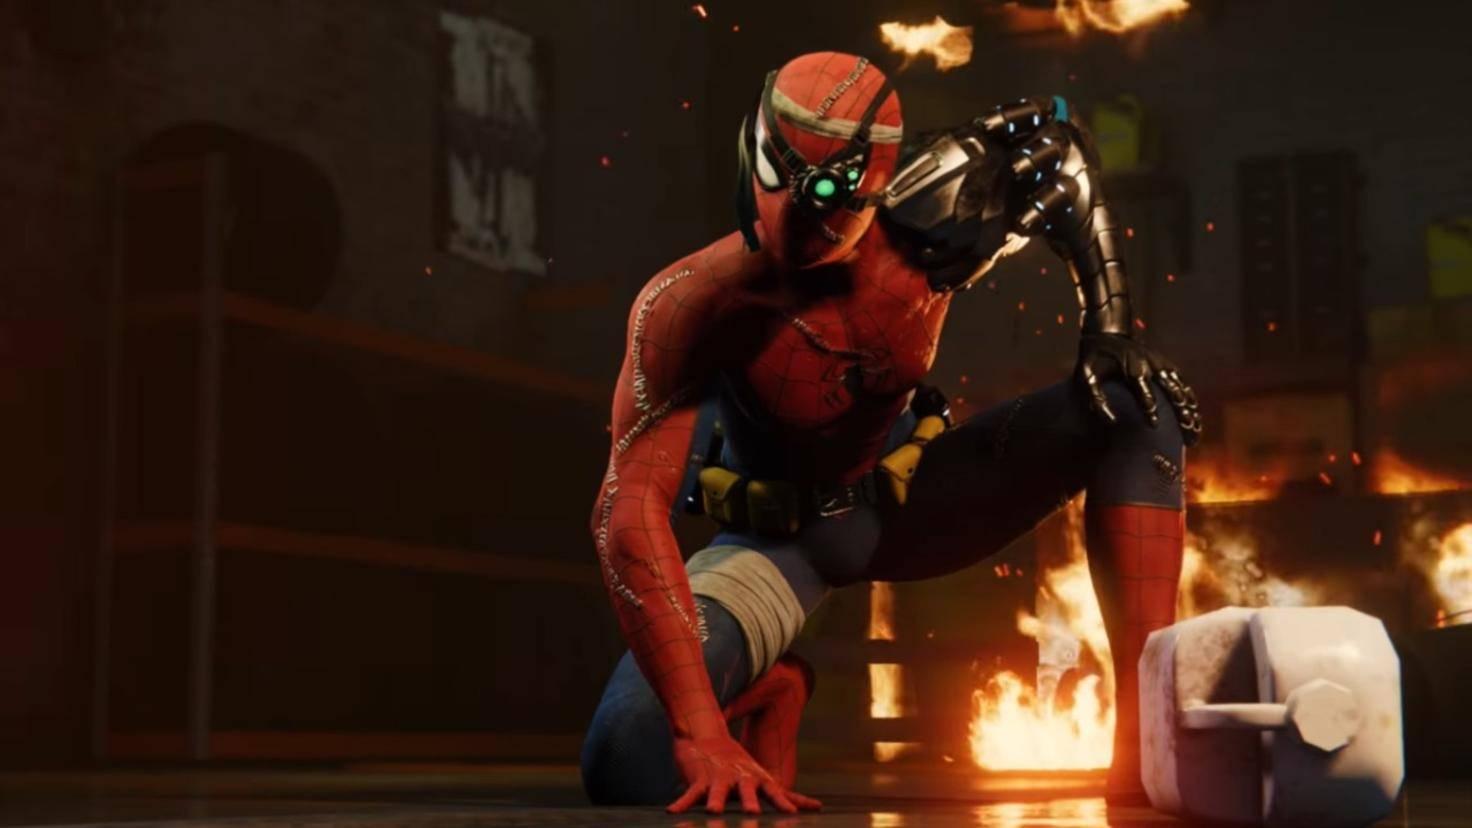 spider-man-ps4-cyborg-anzug-screenshot